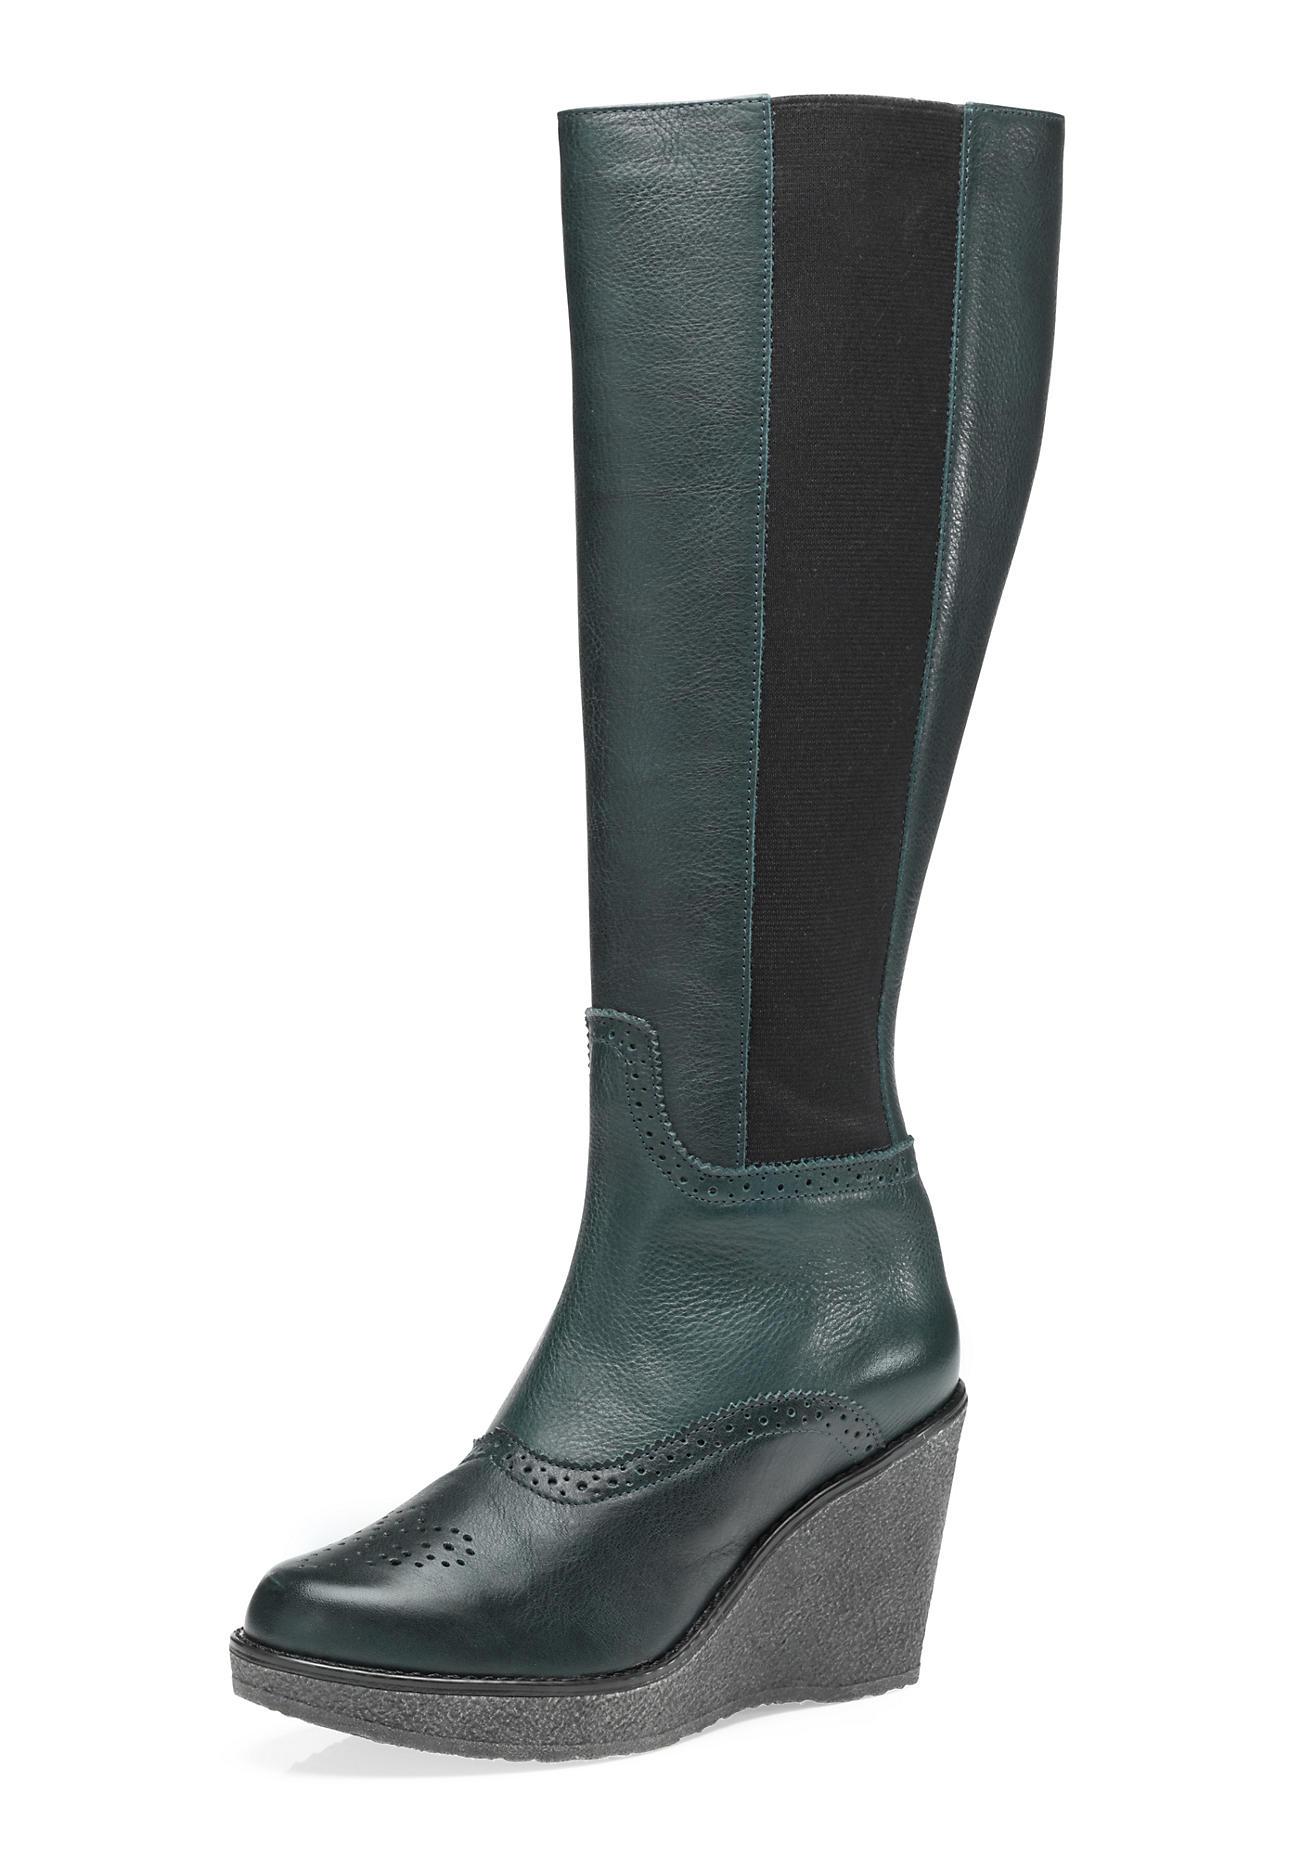 Stiefel - hessnatur Damen Damen Stiefel aus Leder – grün –  - Onlineshop Hessnatur